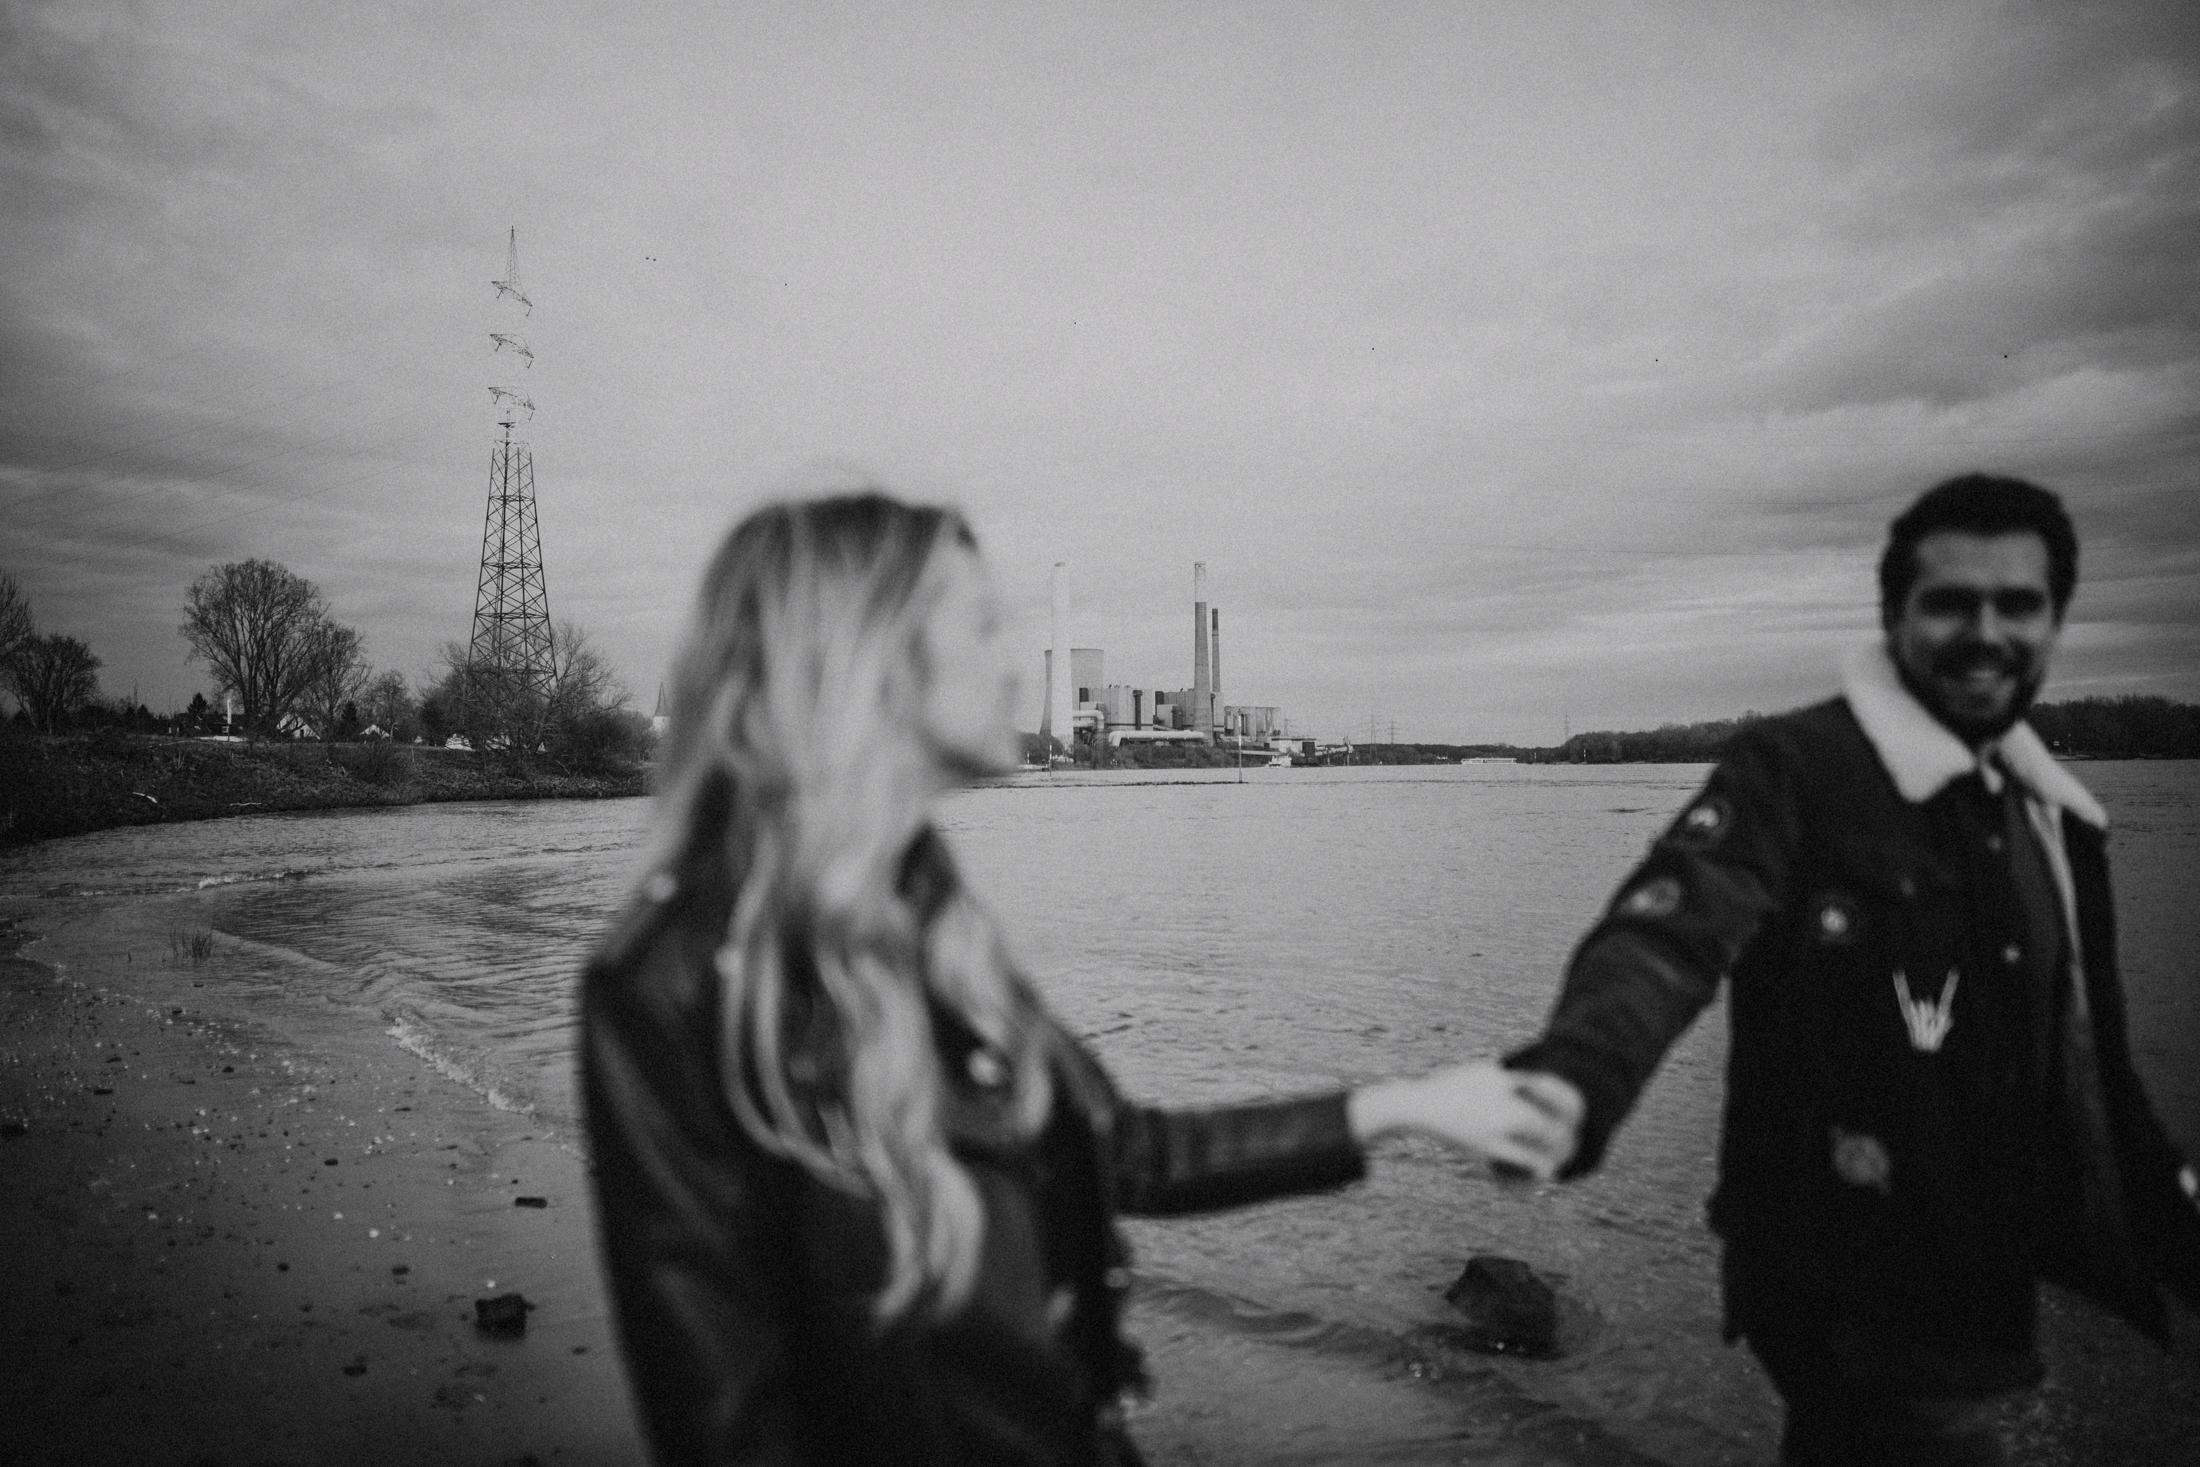 Wedding_Photographer_Mallorca_DanielaMarquardt_Photography_CanaryIslands_Lanzarote_Iceland_Tuscany_Santorini_Portugal_NewYork_Spain_Elopement_Hochzeitsfotograf_CK2